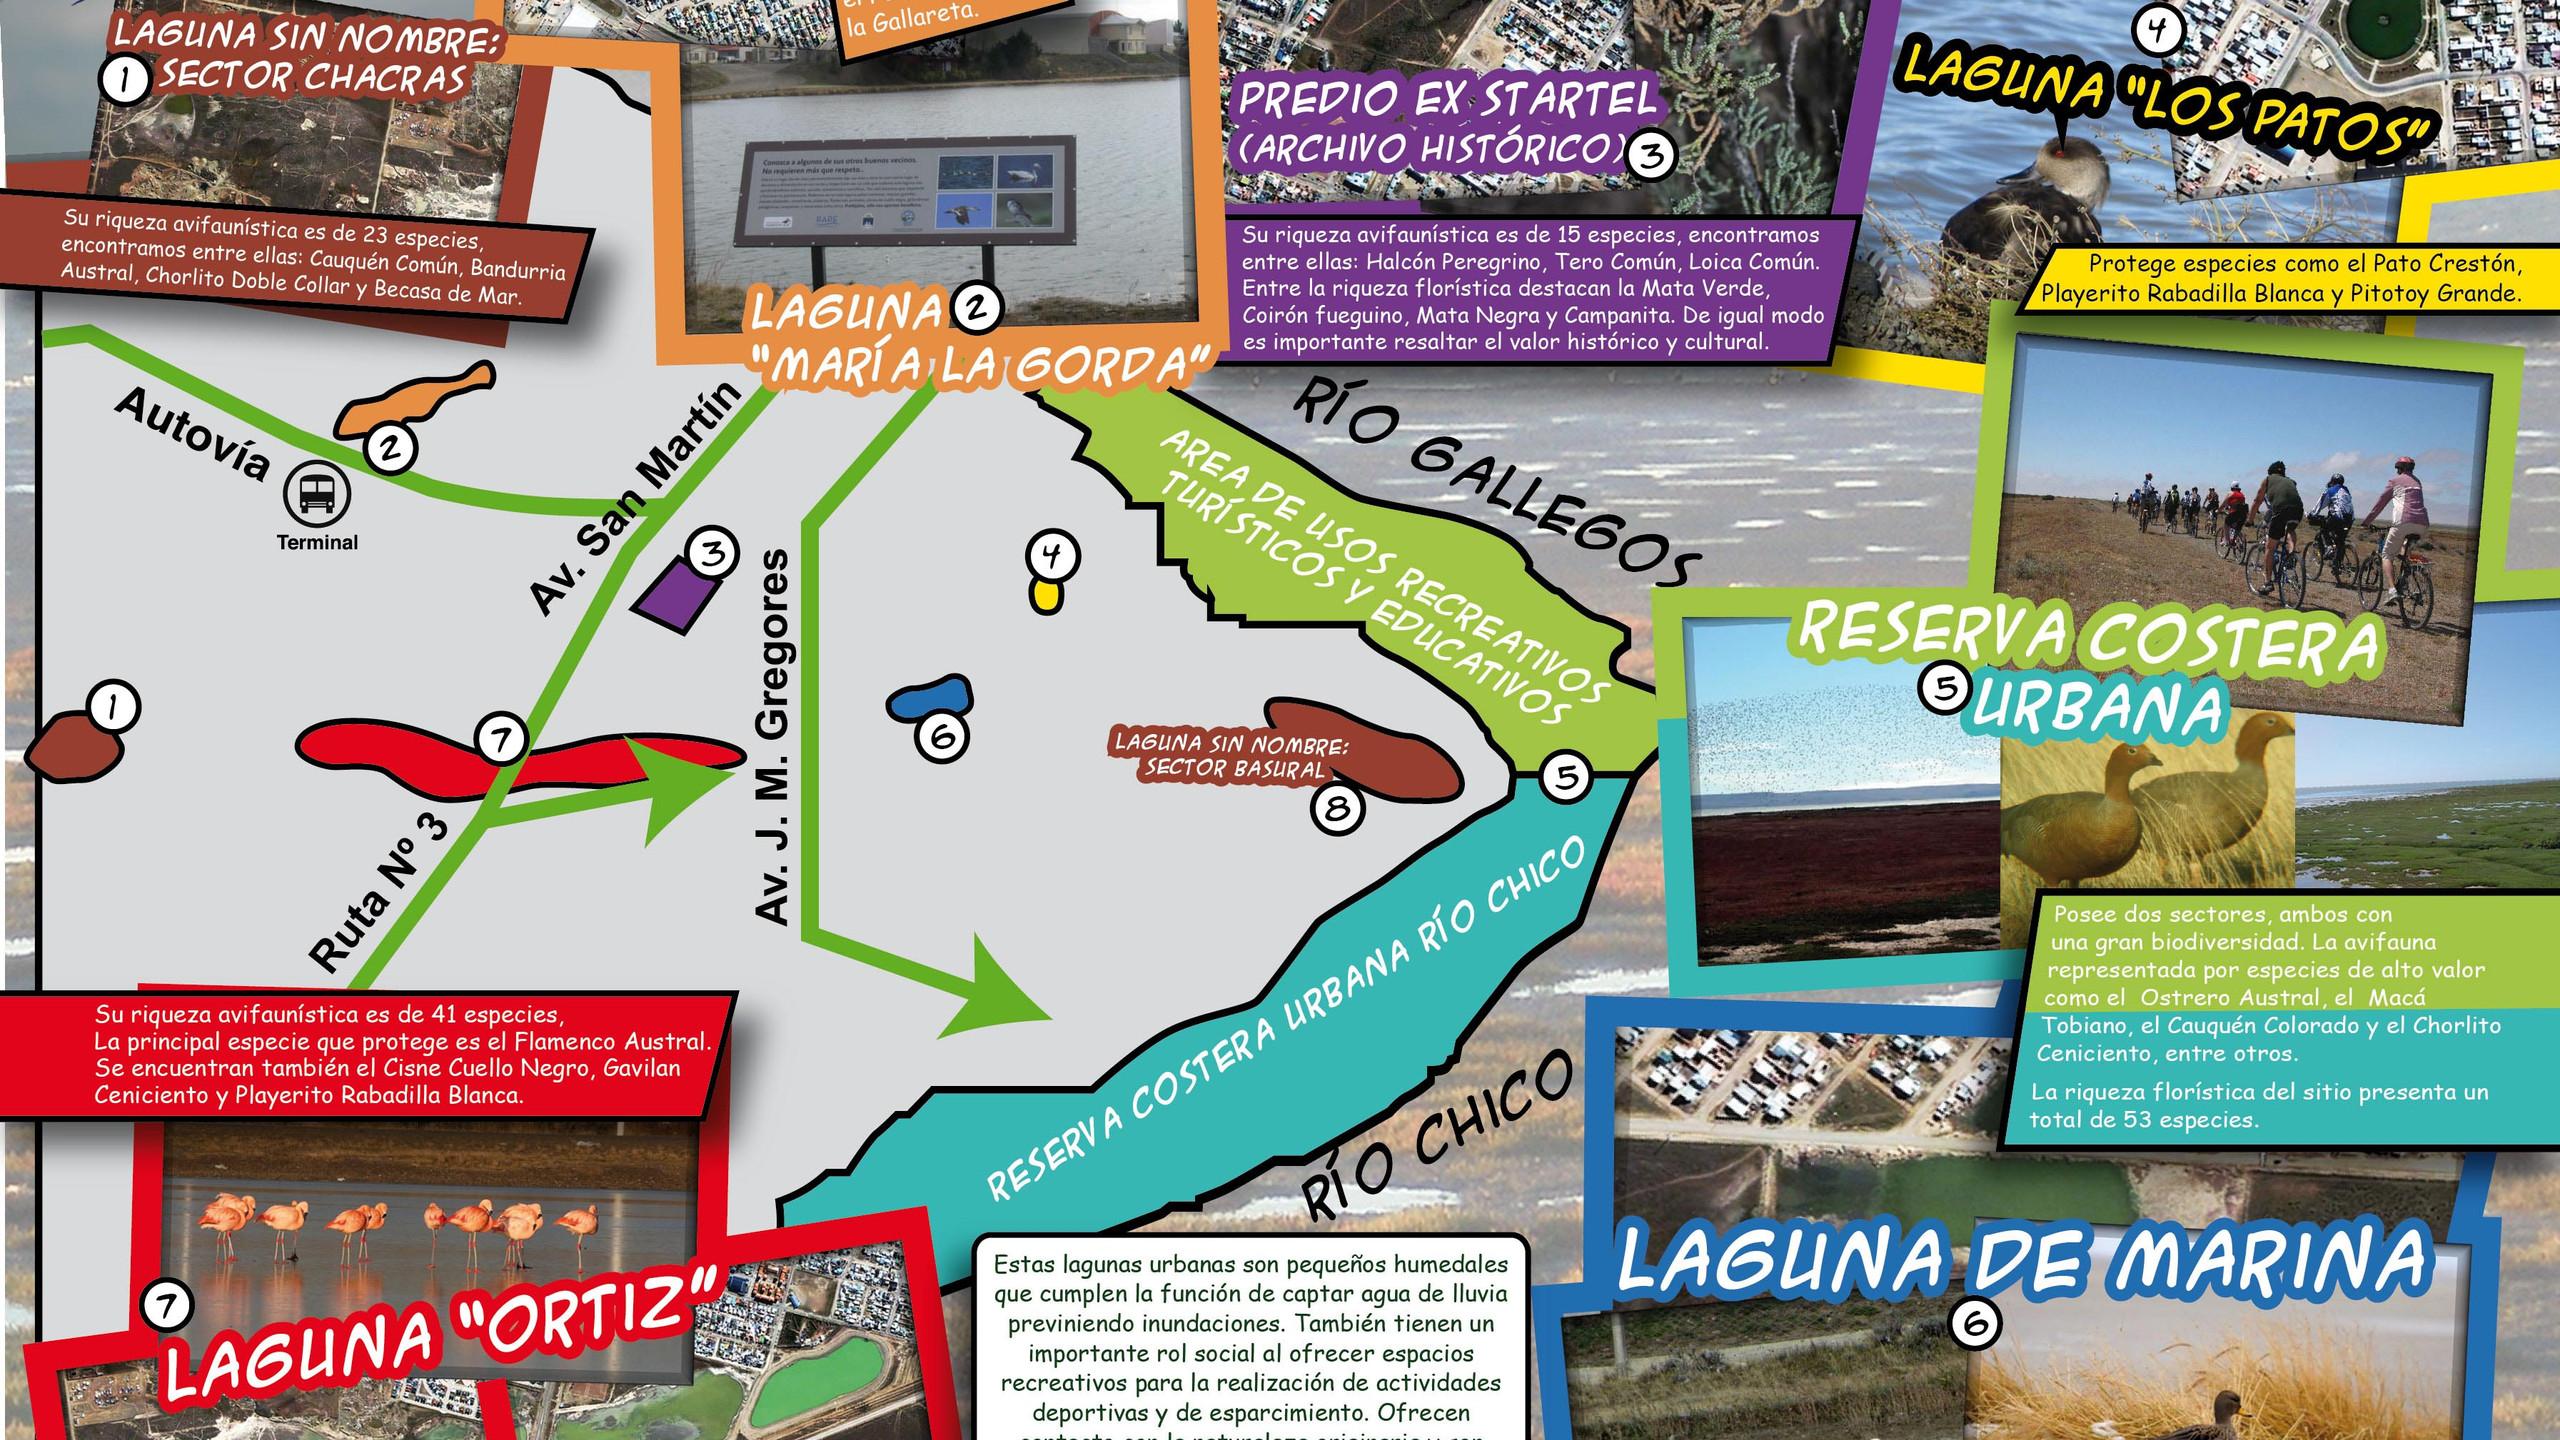 Grafica Reservas Naturales Urbanas Rio Gallegos - FOTO SRNU 5